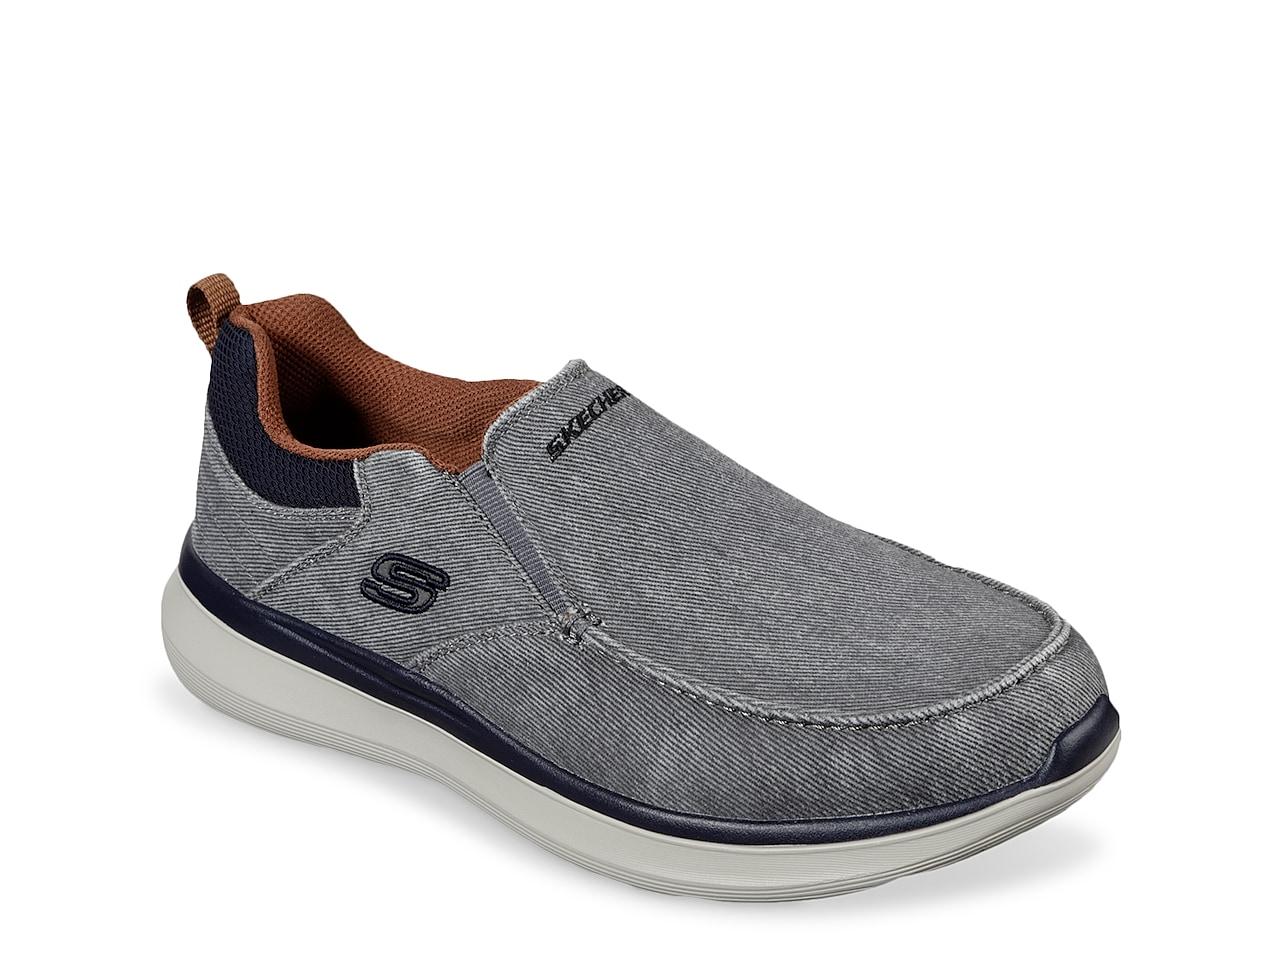 Delson 2.0 Larwin Slip-On Sneaker